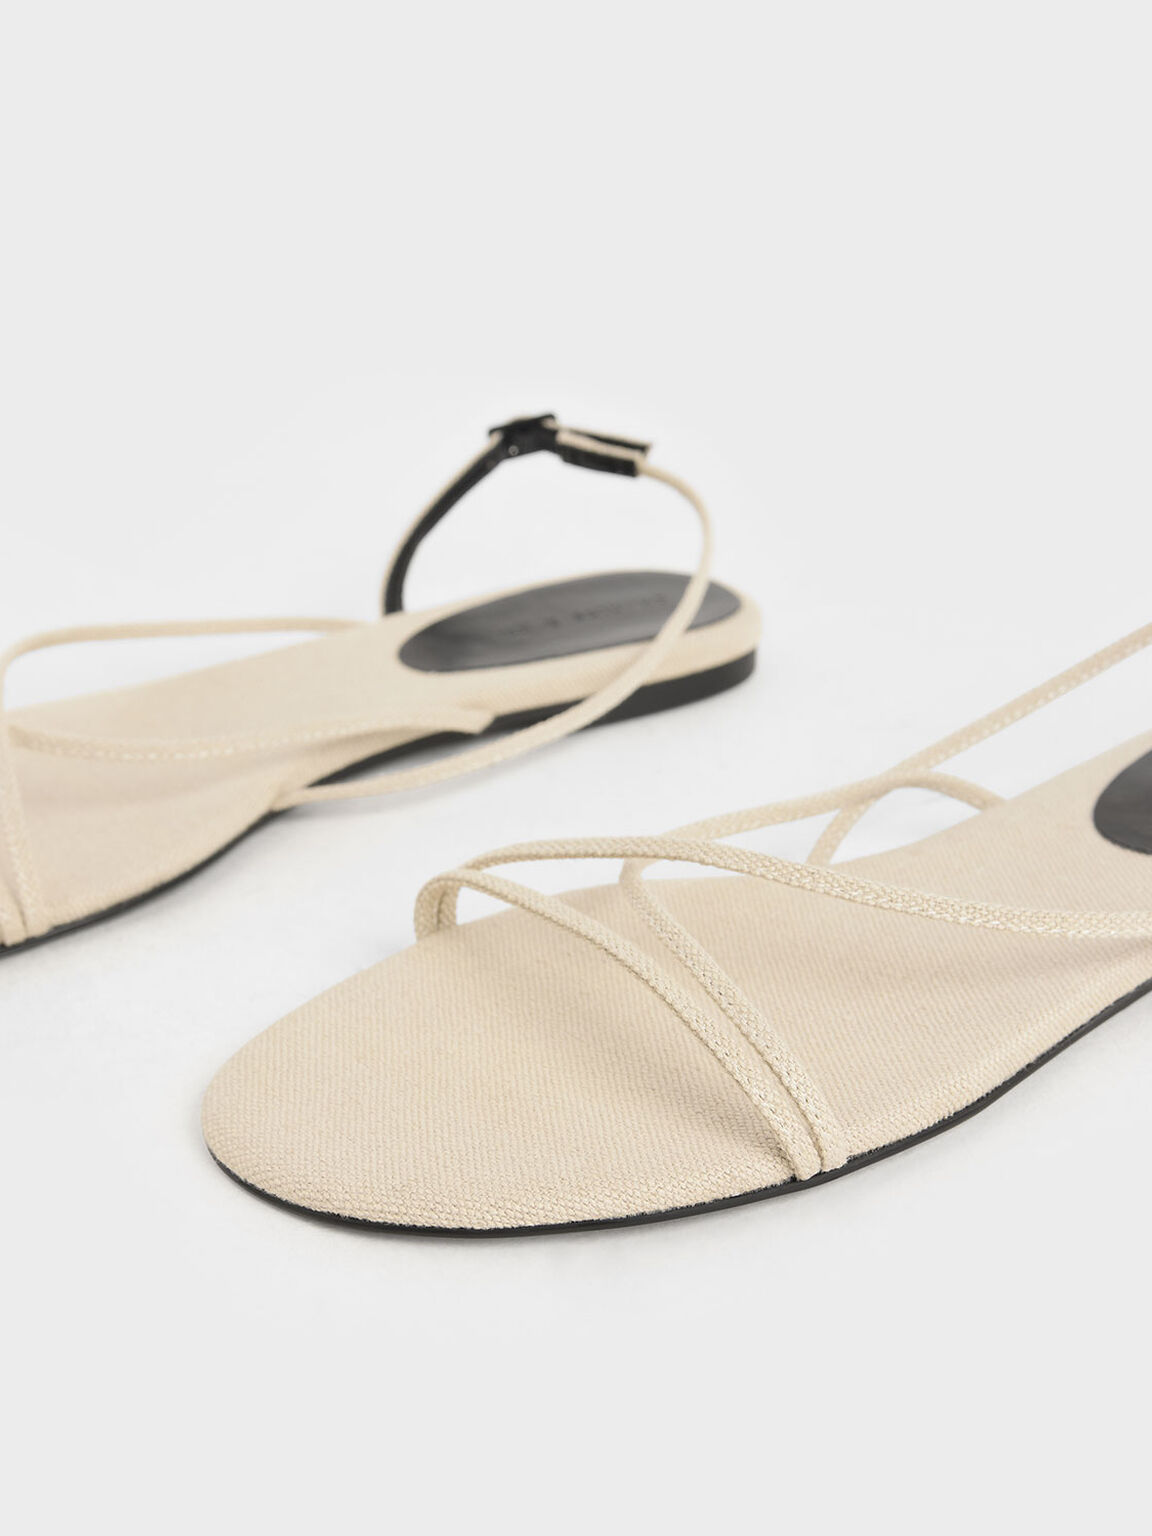 Canvas Strappy Flat Sandals, Beige, hi-res